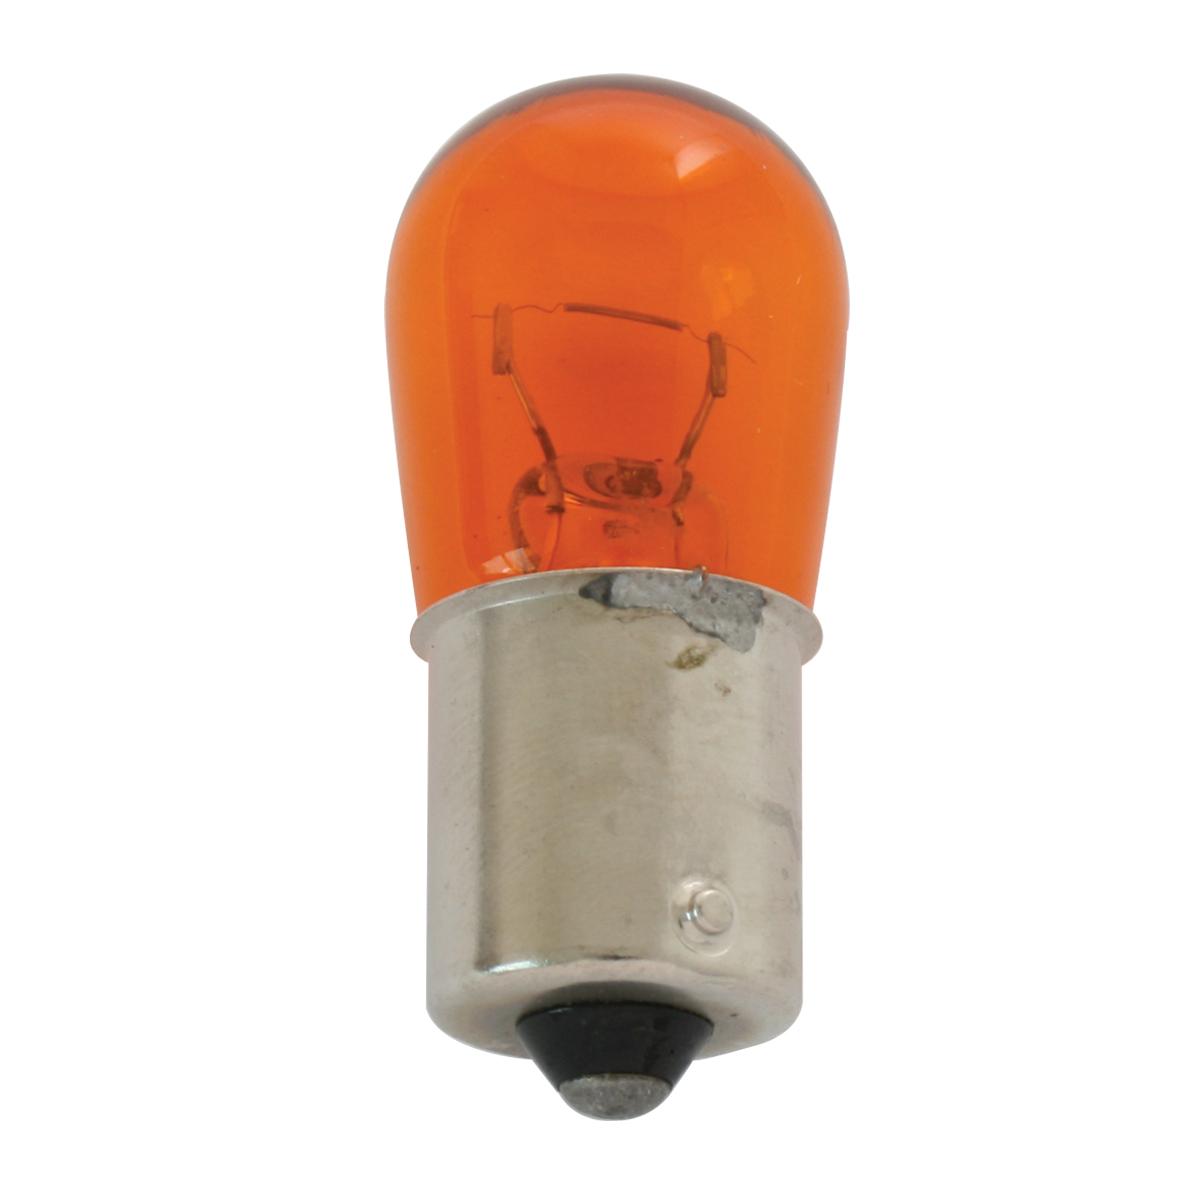 #84001 Miniature Replacement #1003 Amber Light Bulb